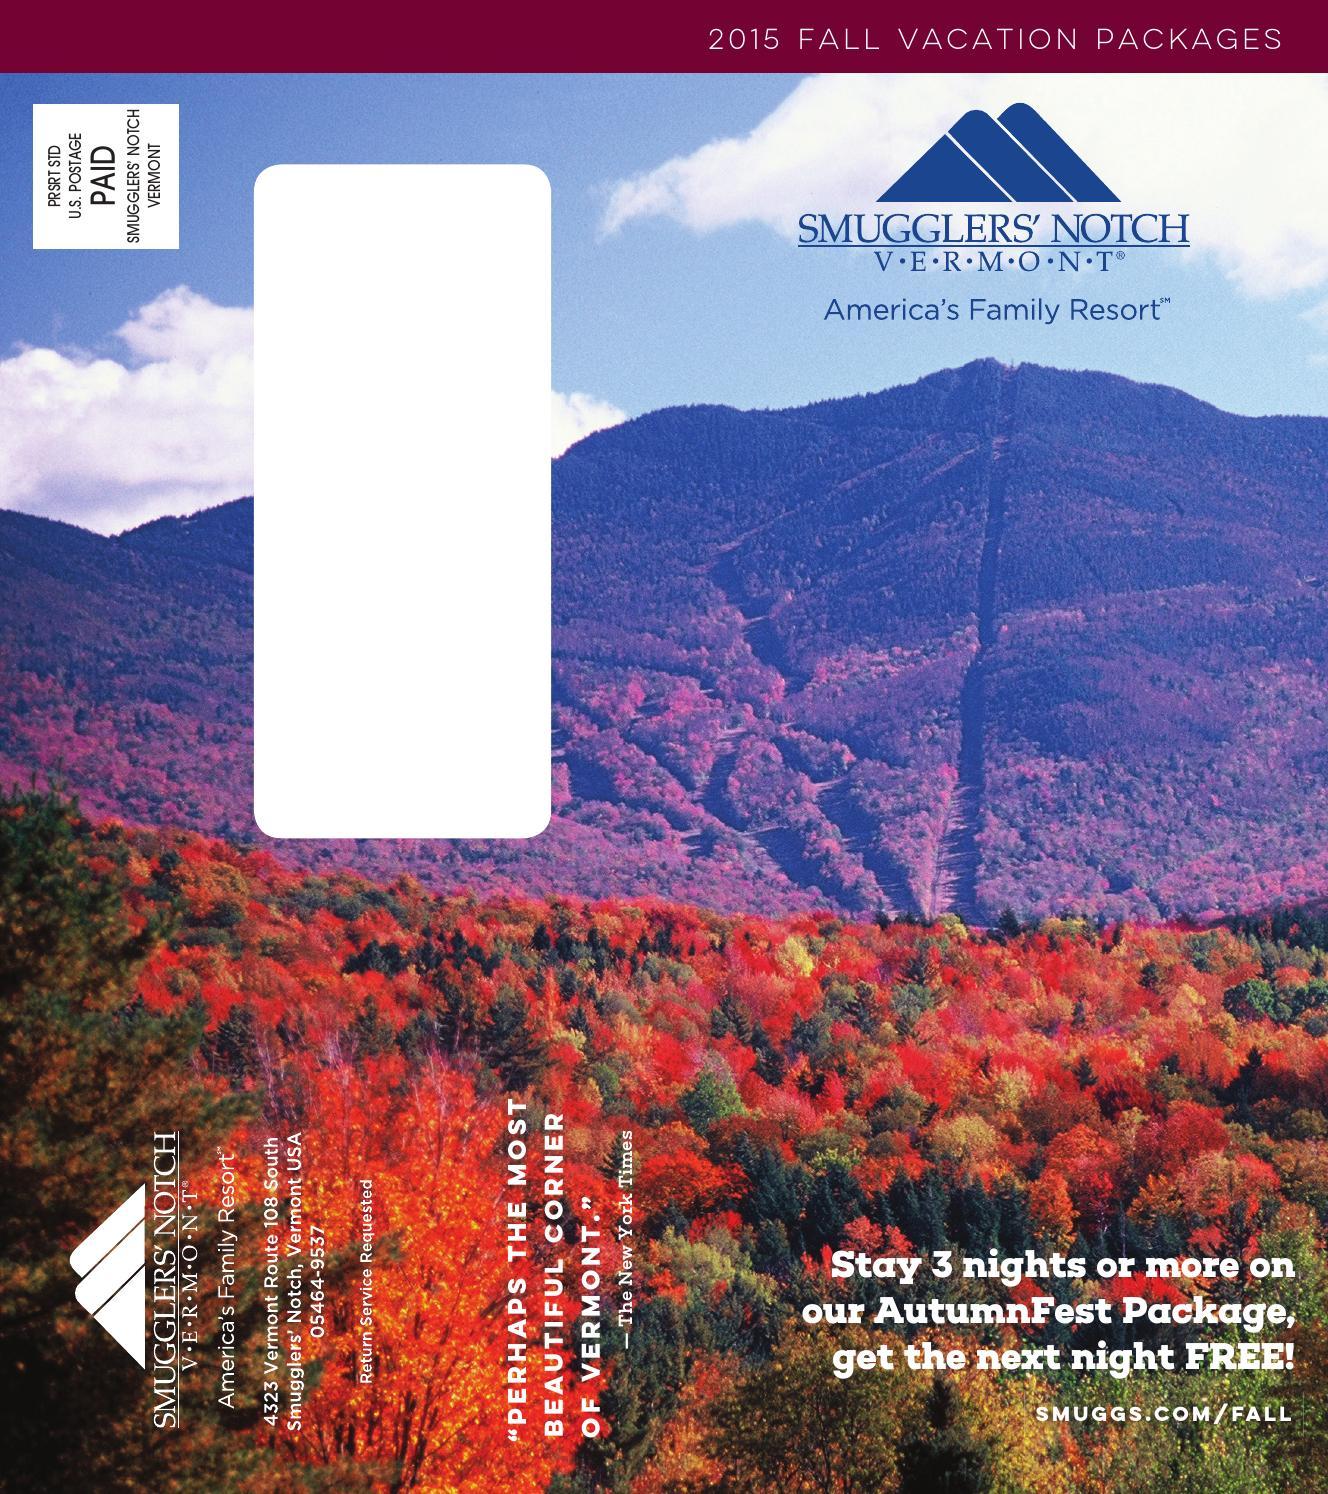 Smugglers' Notch Vermont Fall 2015 By Smugglers' Notch